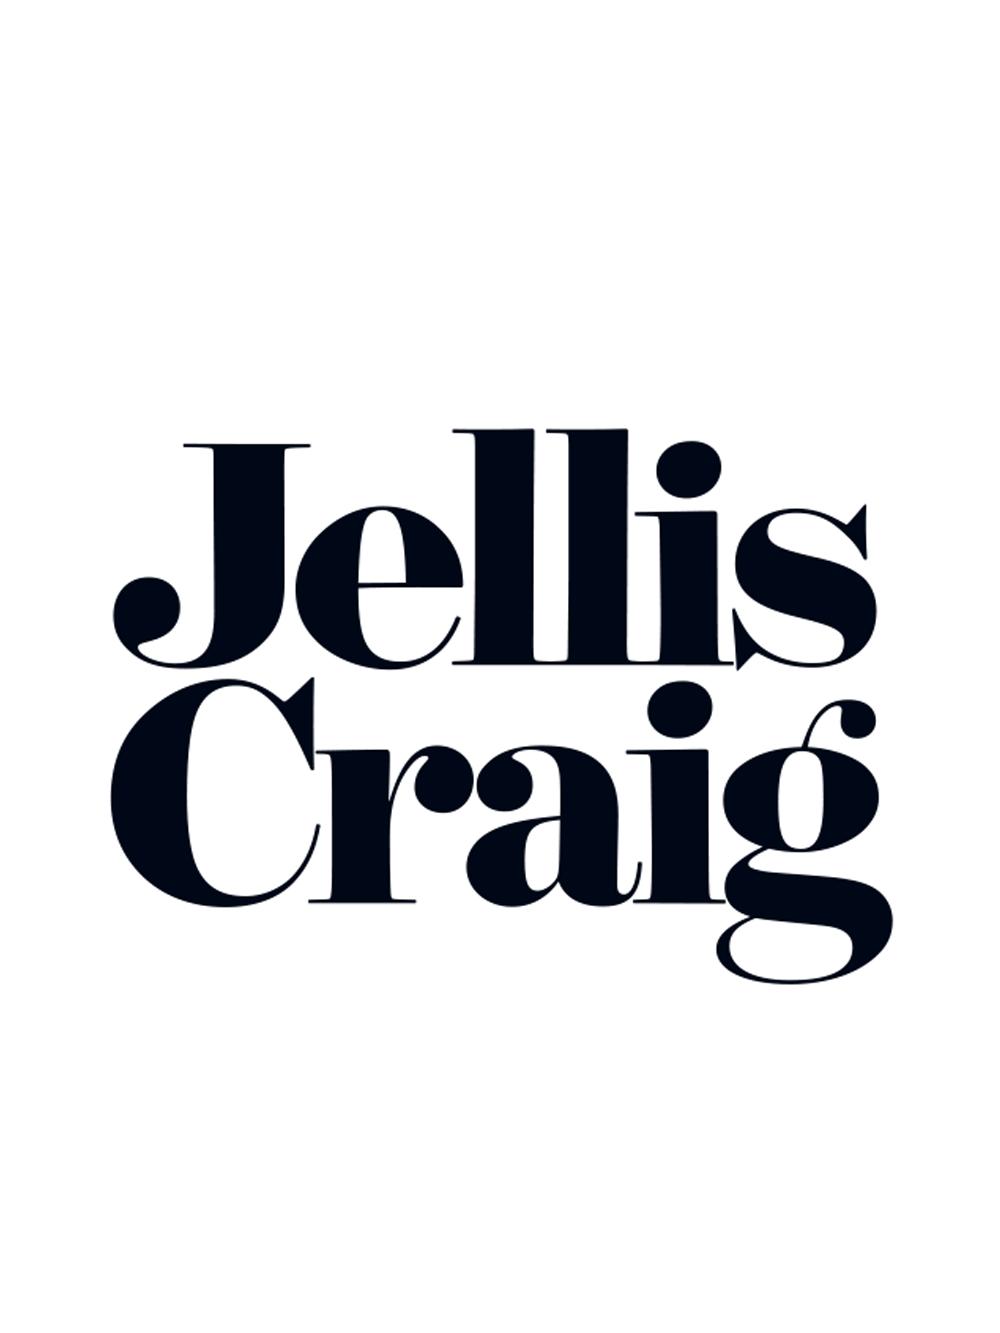 jellis-craig_1000x1333.png